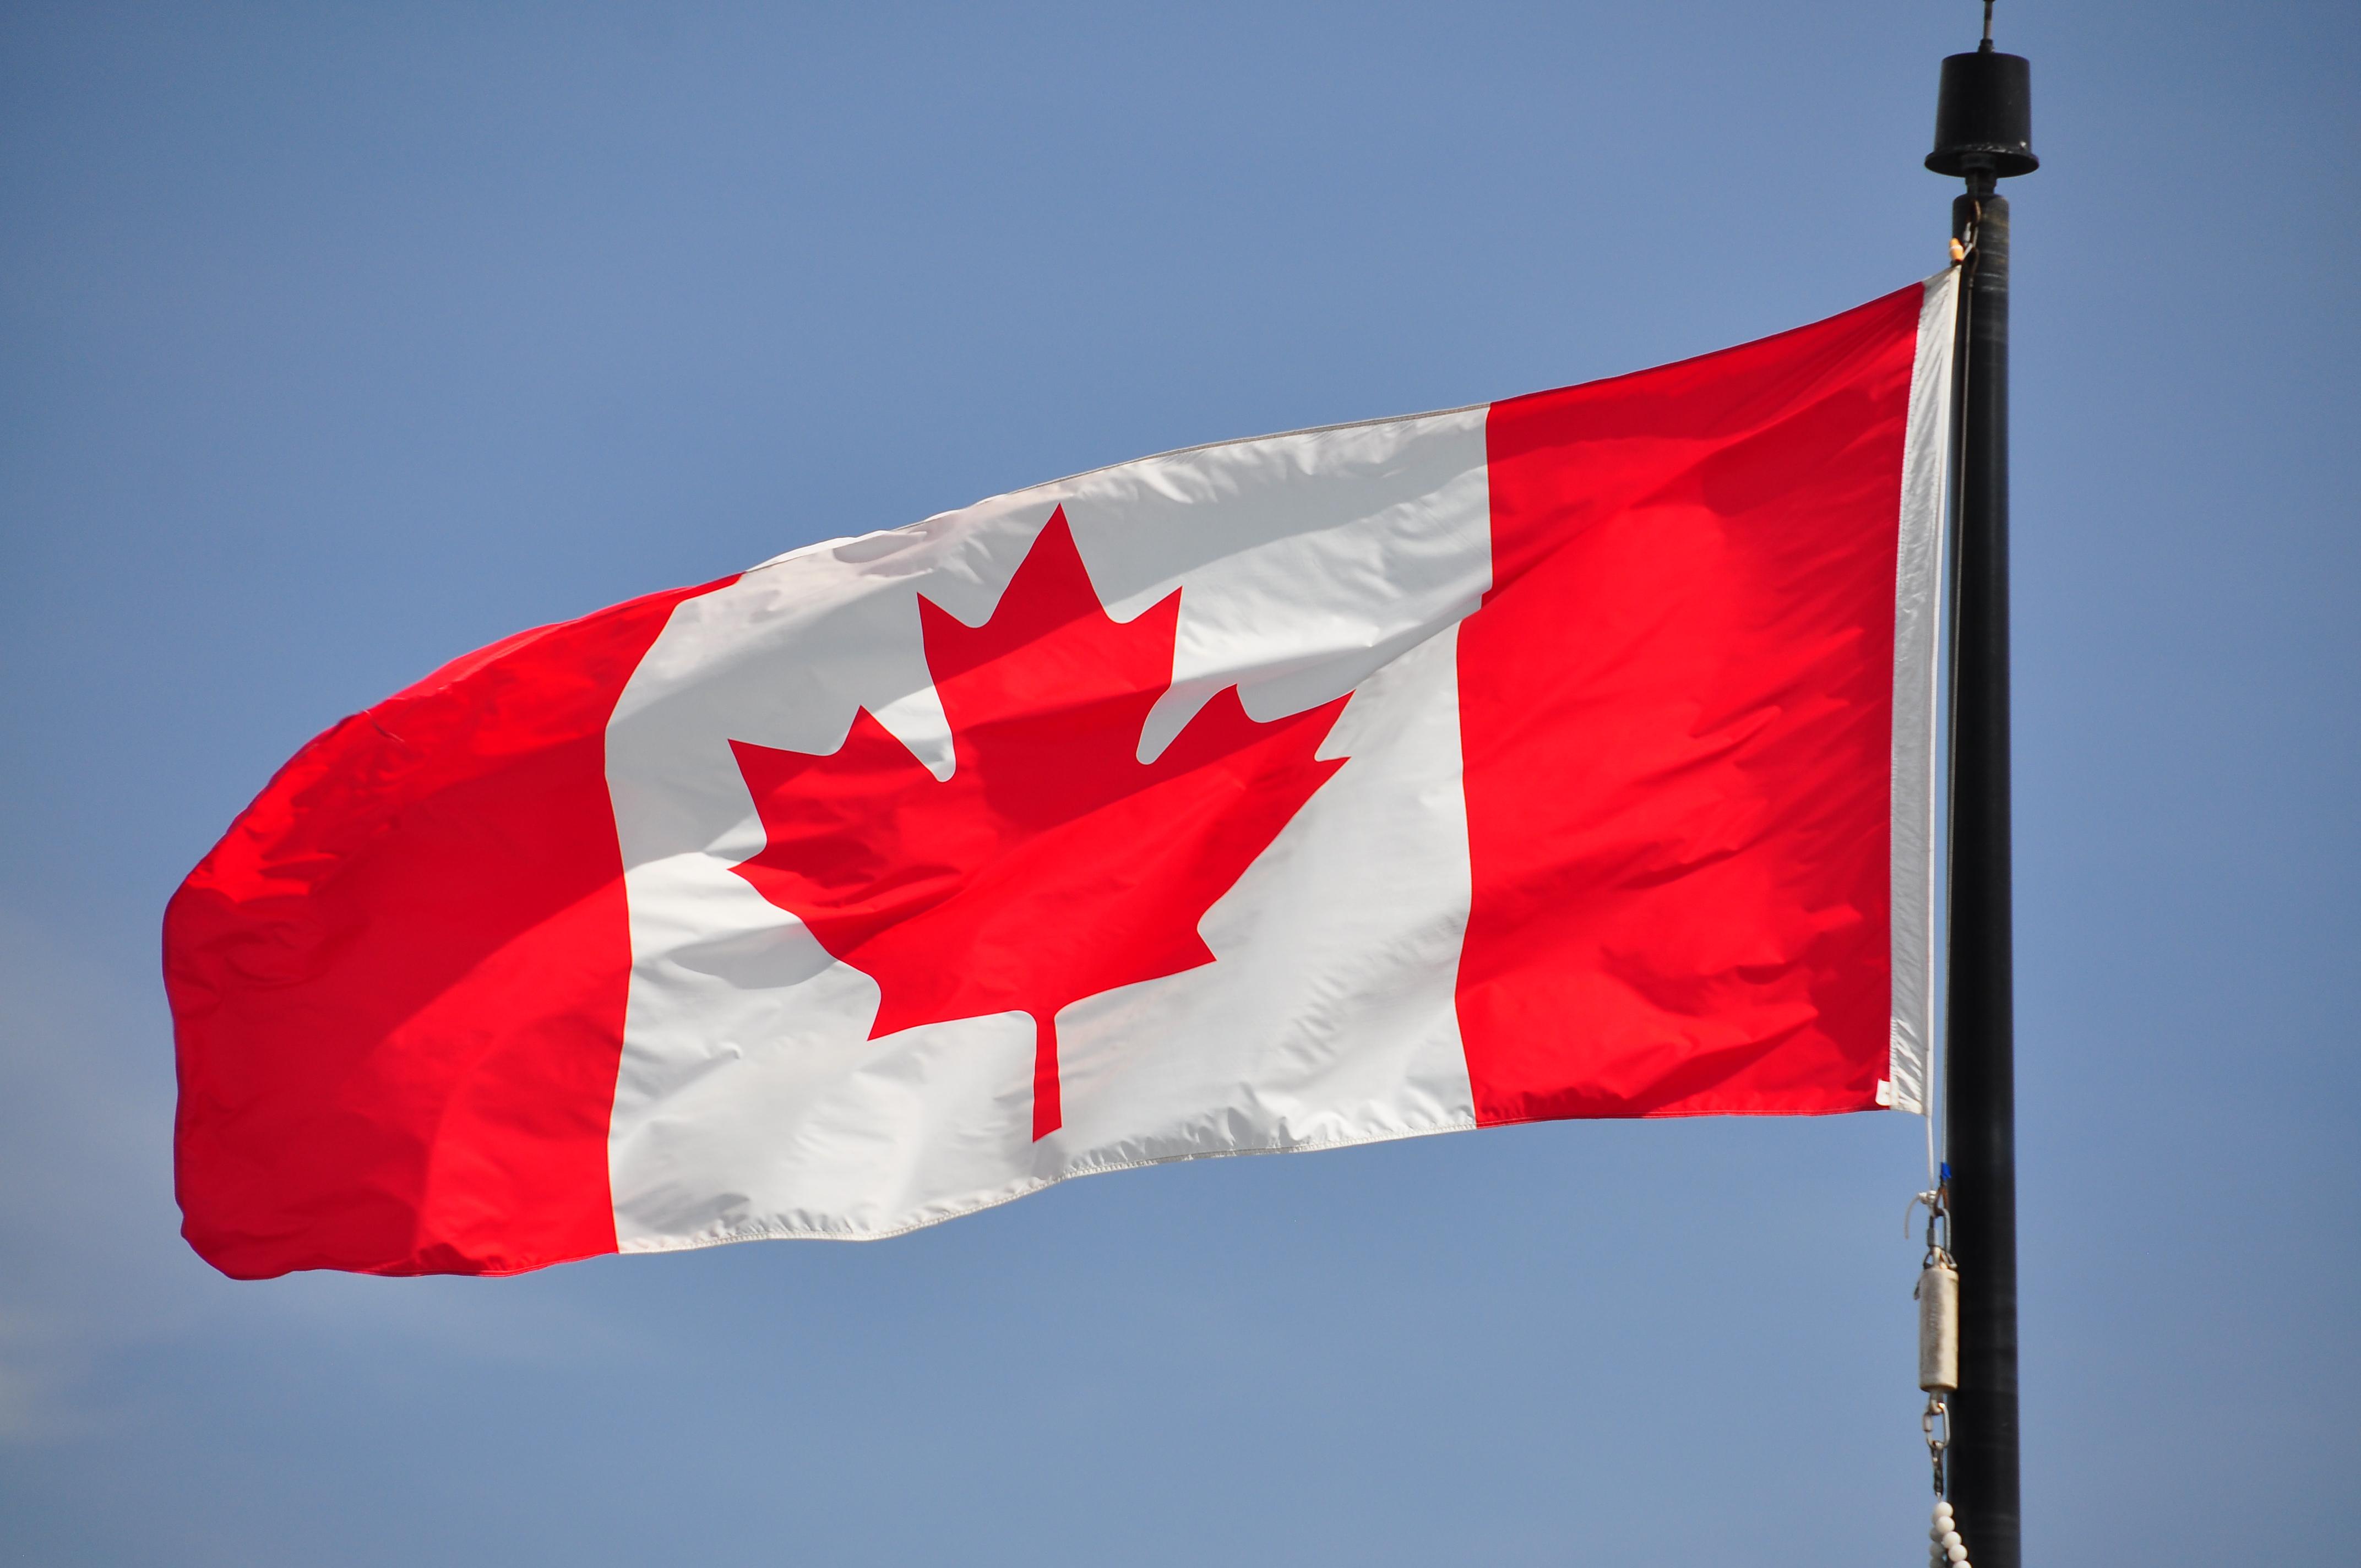 Drapeau canadien - Canadian flag (4629119005).jpg